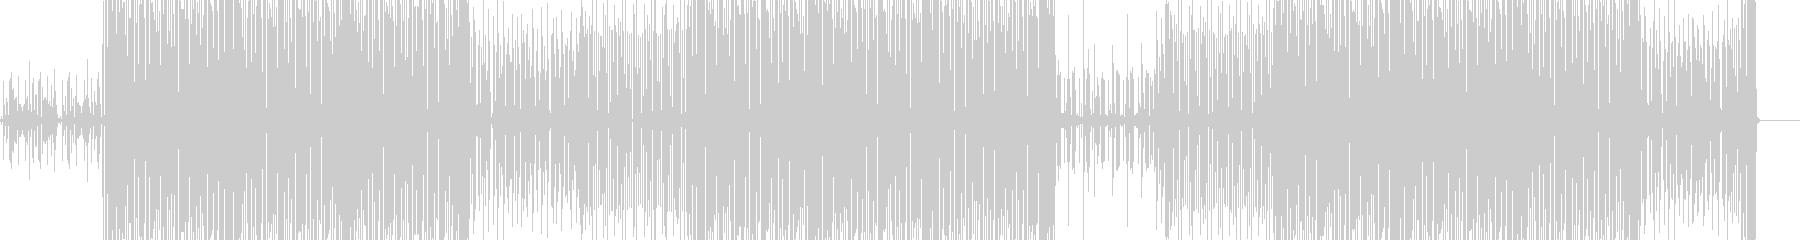 House music / Vogueの未再生の波形